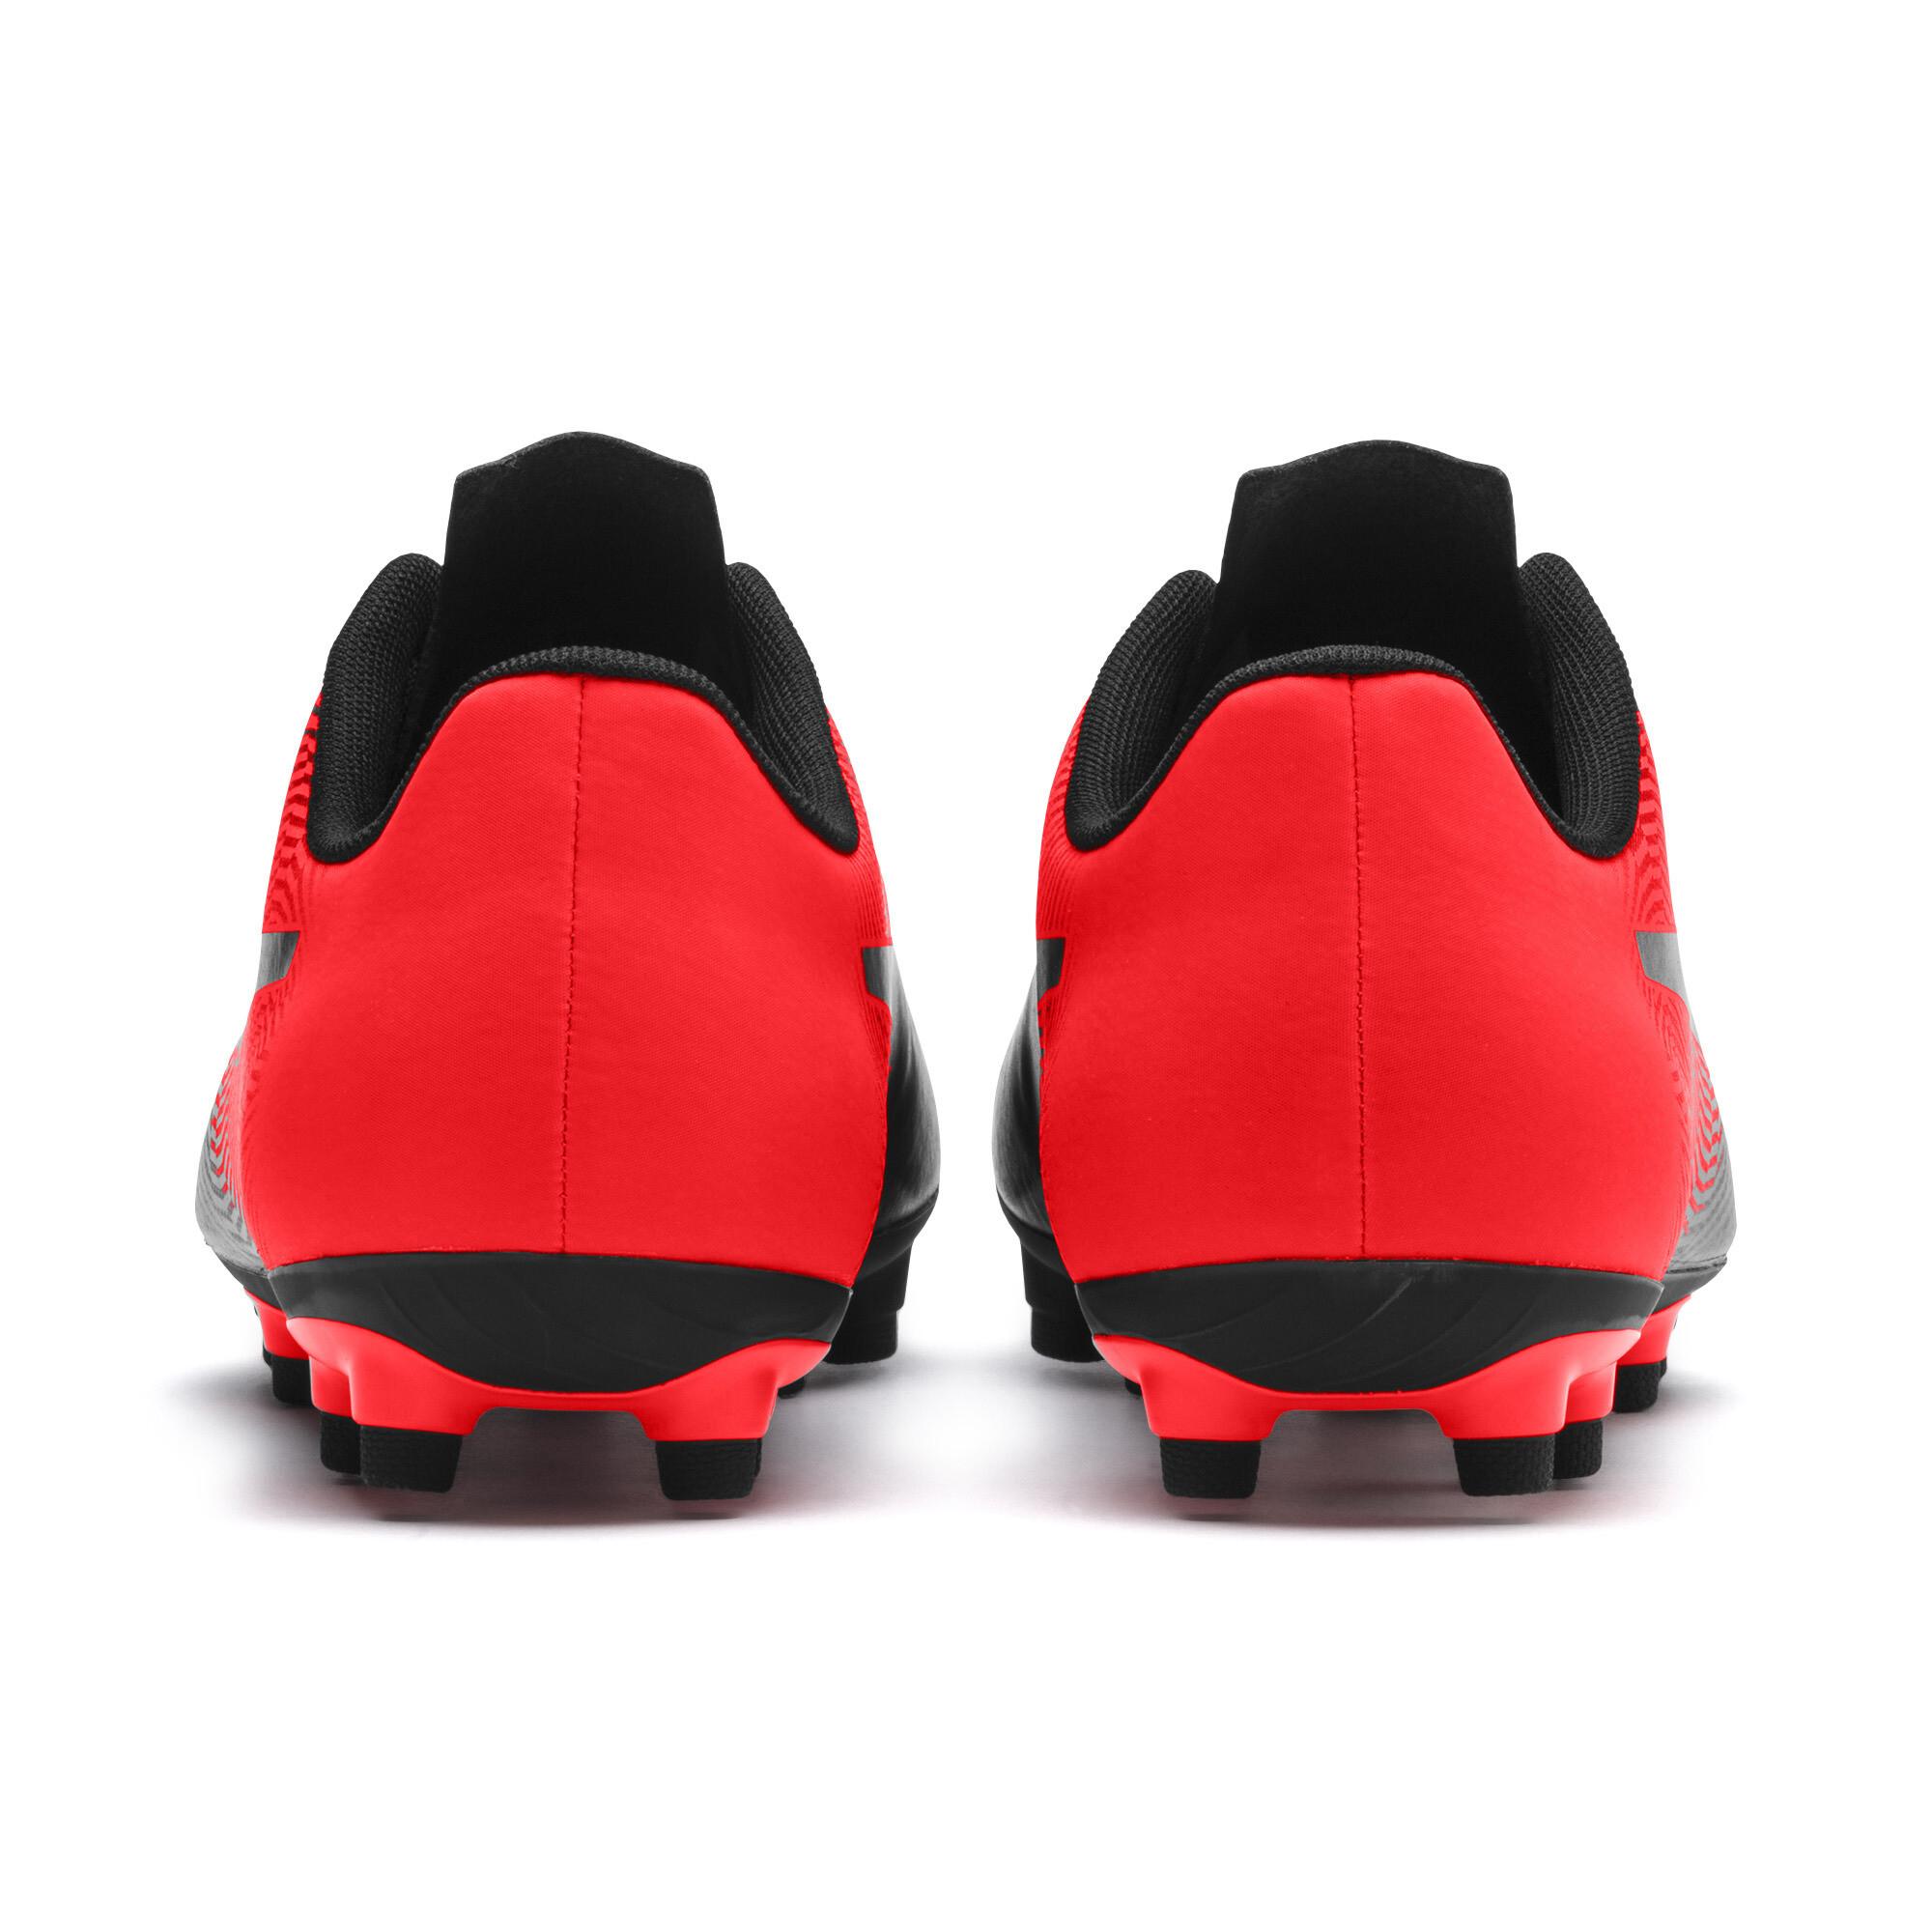 27d1393603 Details about PUMA PUMA Spirit II FG Men's Soccer Cleats Men Shoe Football